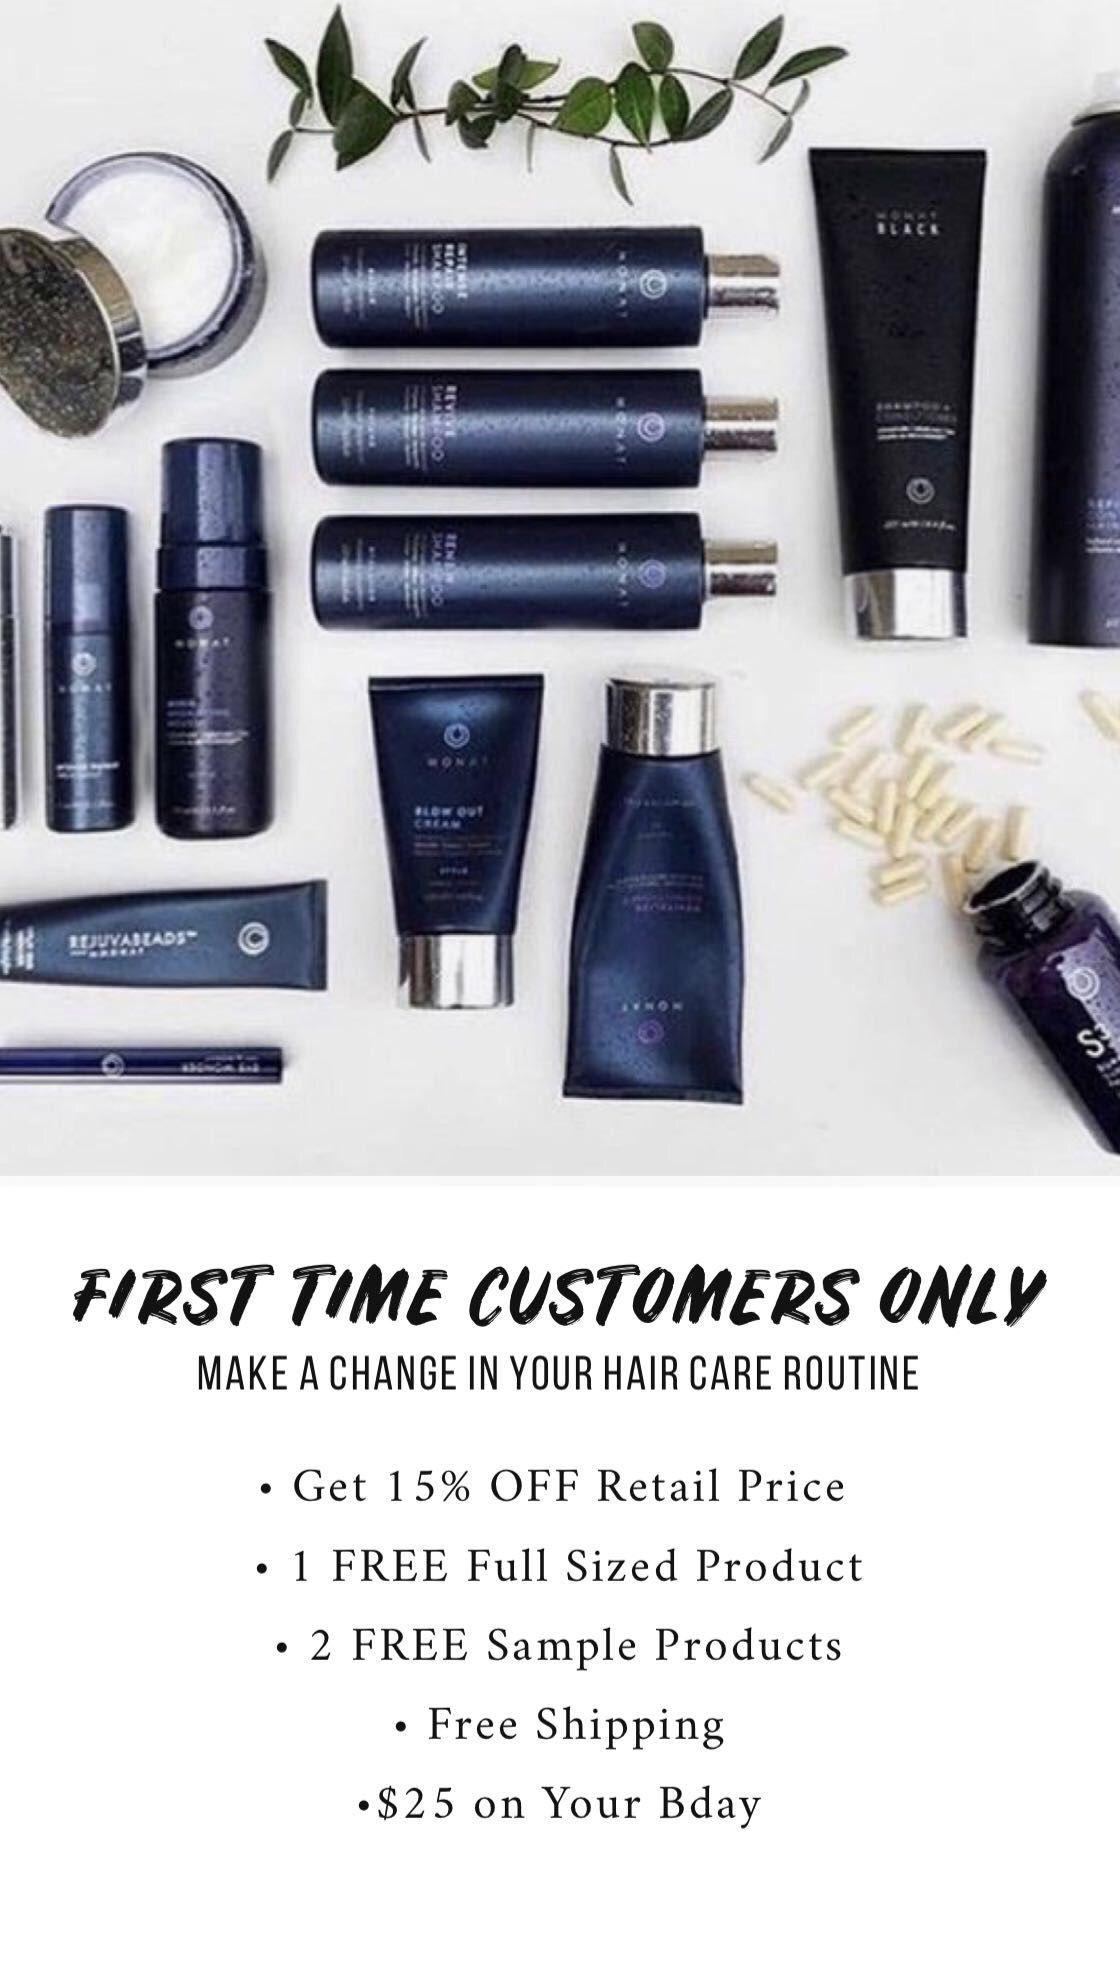 Hair care, haircare, monat, monat VIP | Monat Business in